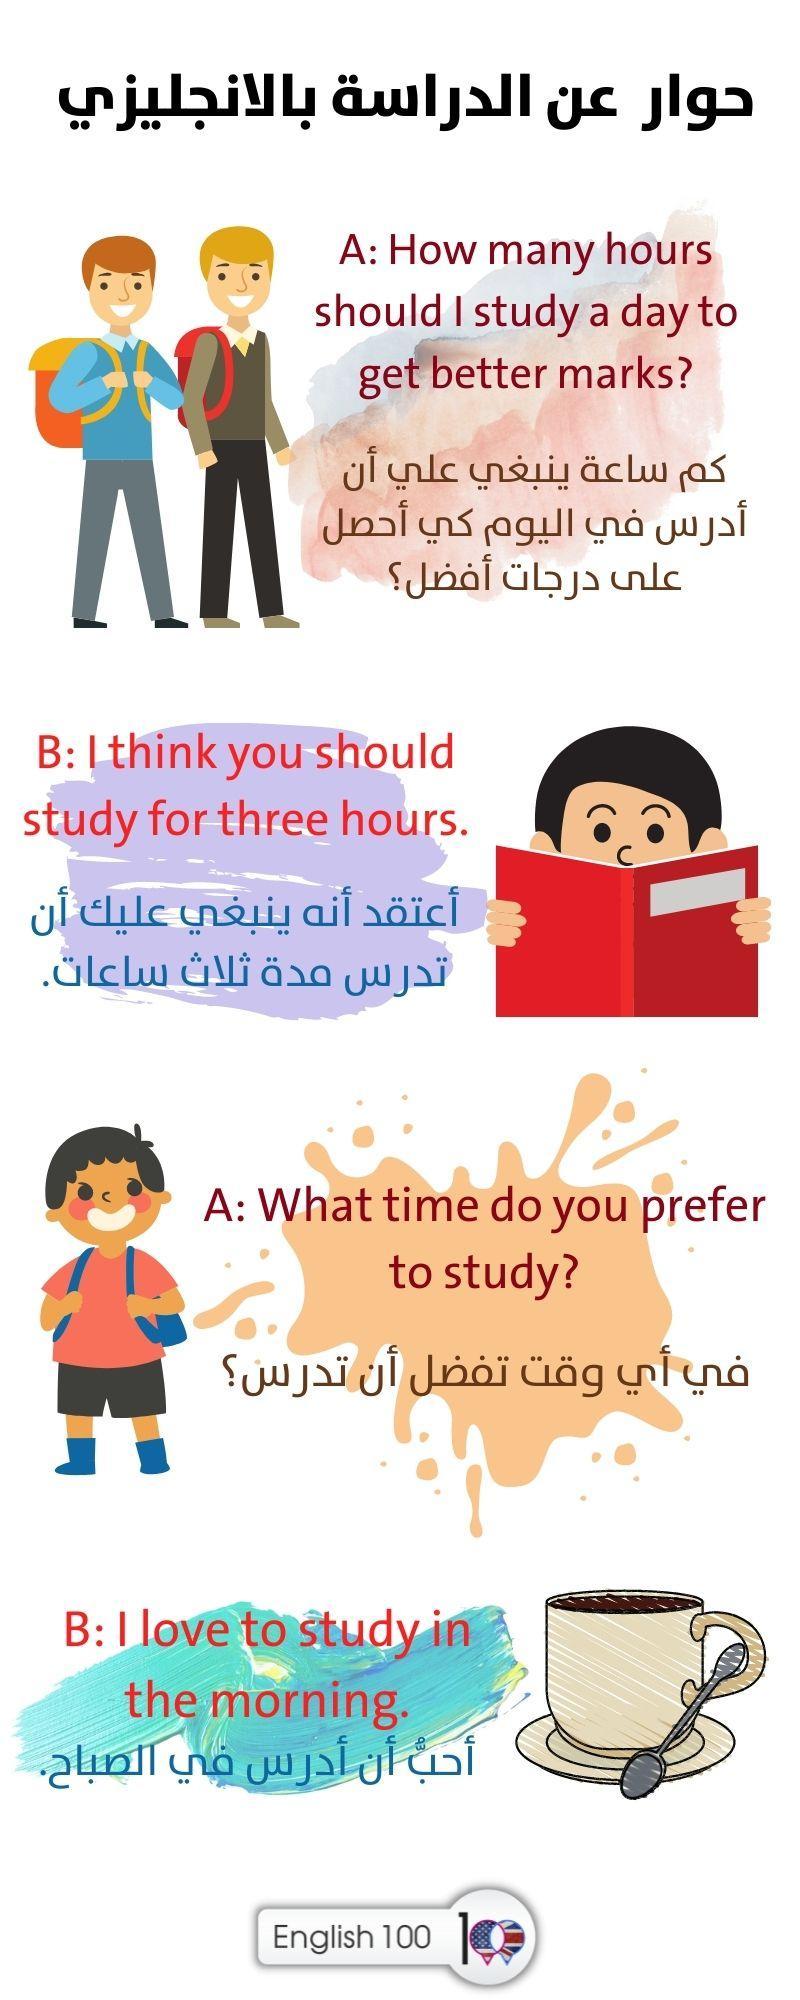 حوار بين شخصين بالانجليزي عن الدراسة قصير A Short Dialogue Between Two People about Studying